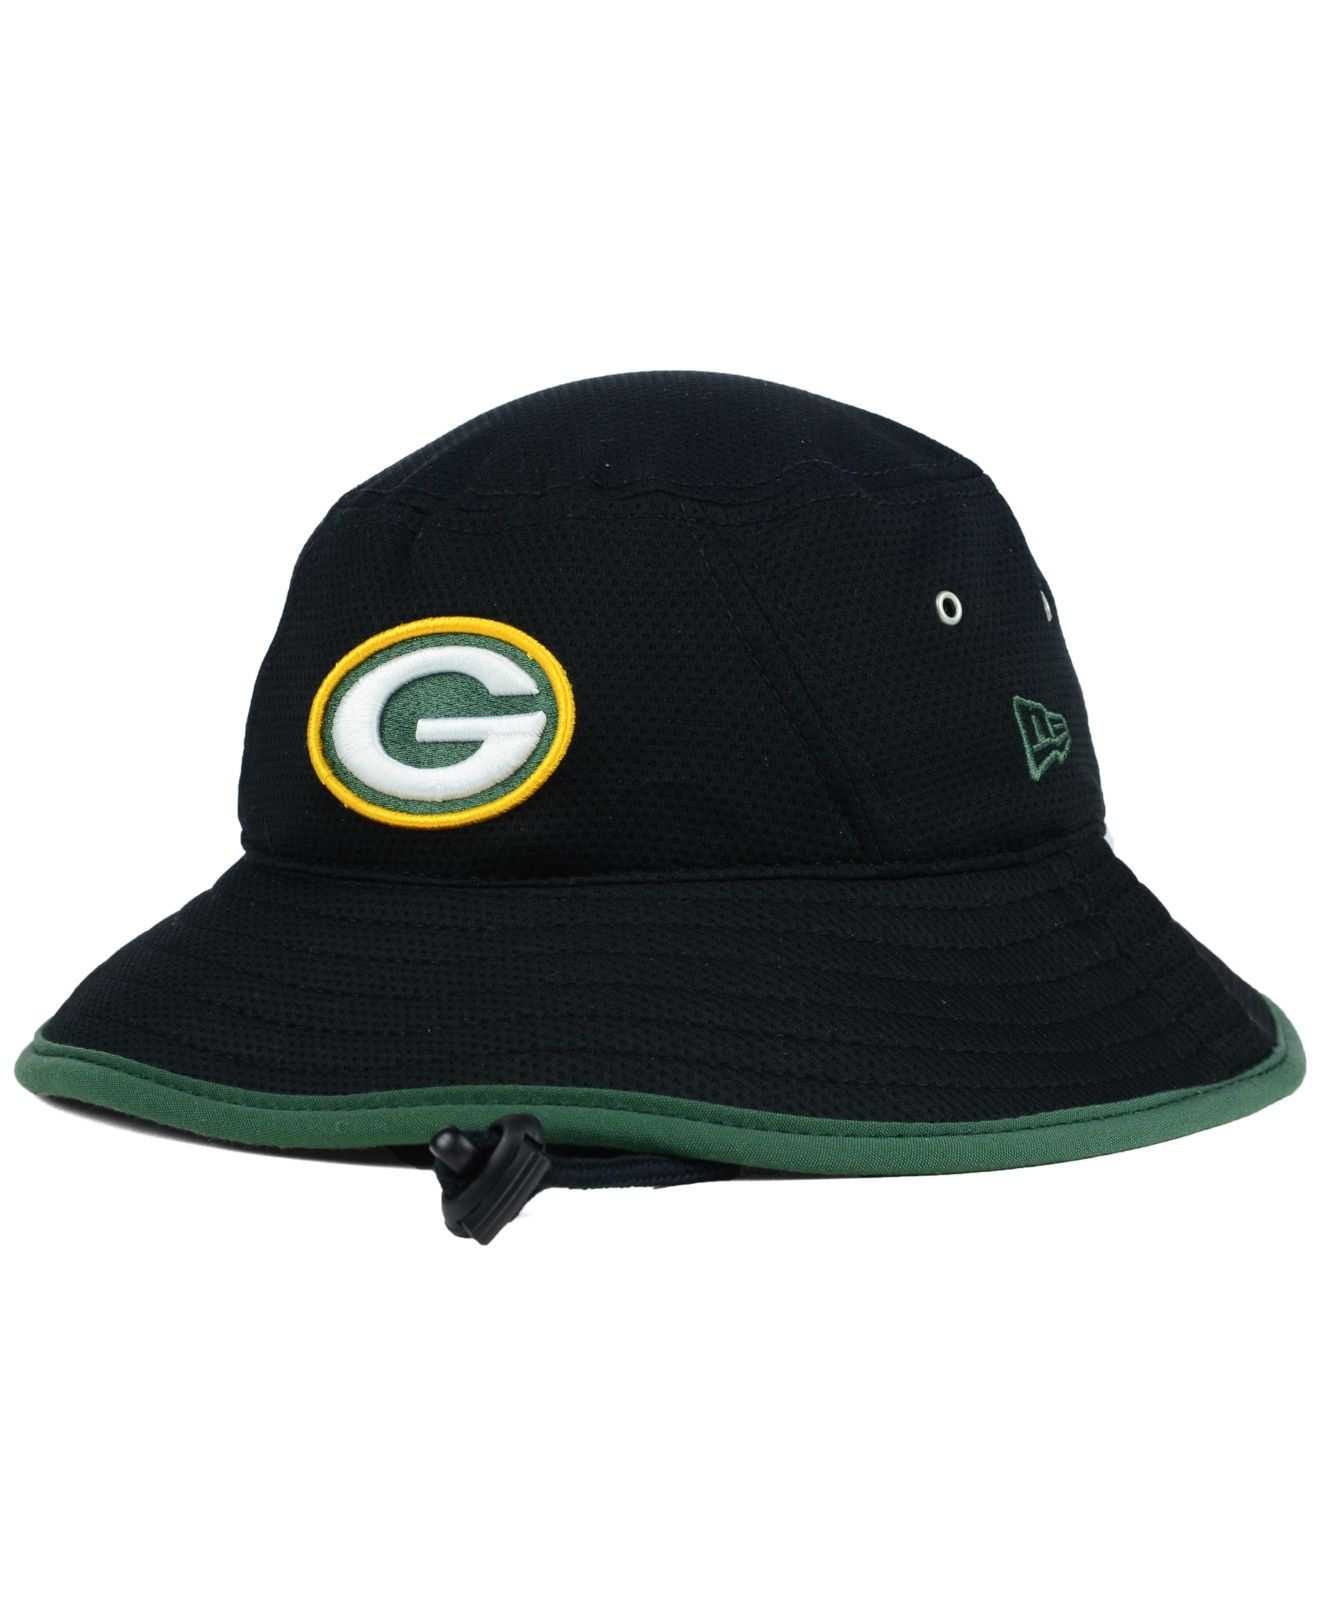 c0b6dc245 KTZ Black Green Bay Packers Training Bucket Hat for men